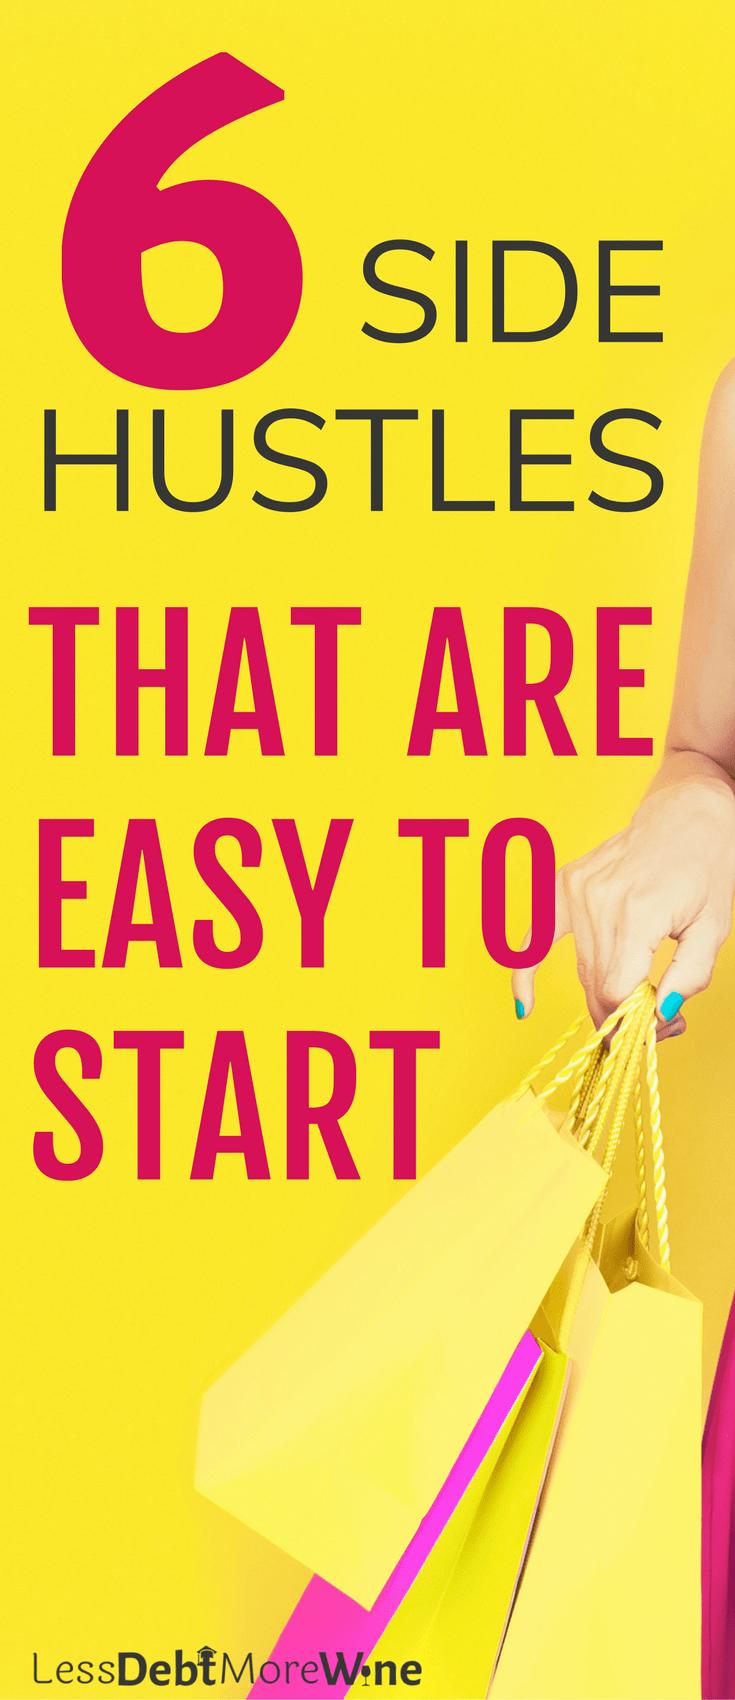 side hustle   earn more money   make extra cash